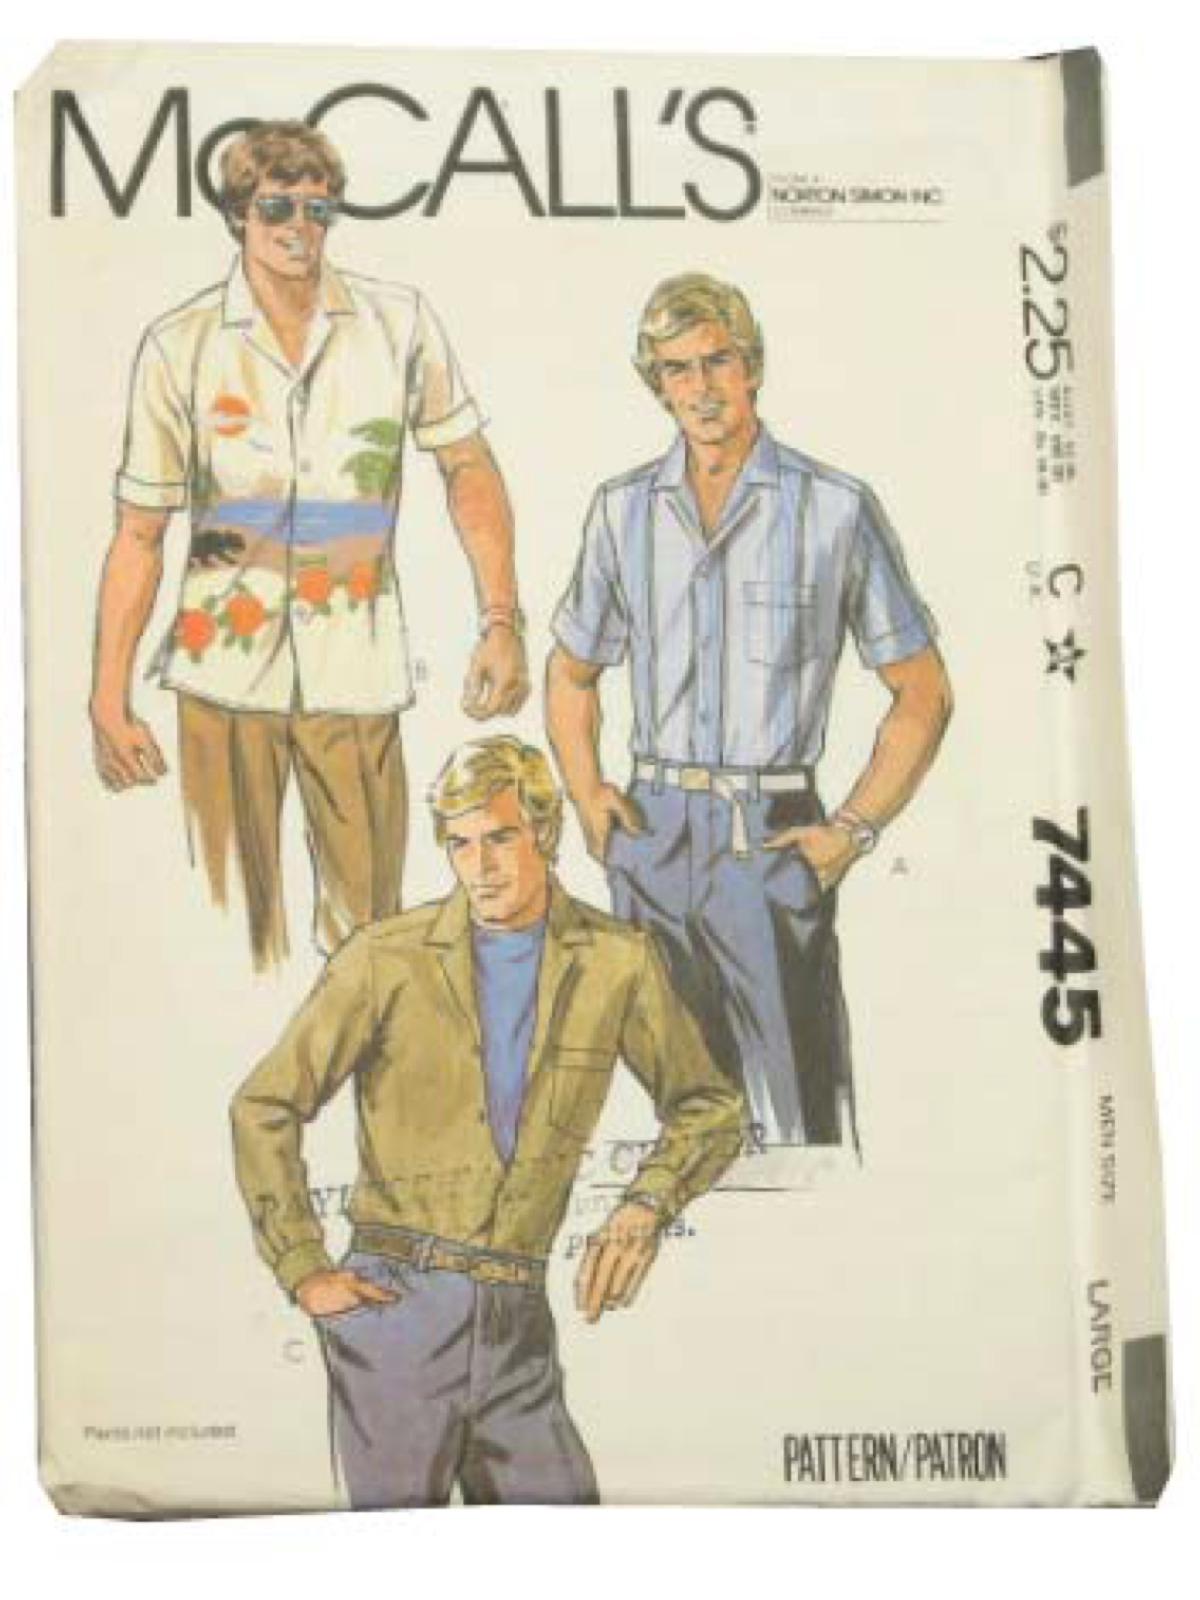 Vintage 1980s Sewing Pattern 80s McCalls Pattern No